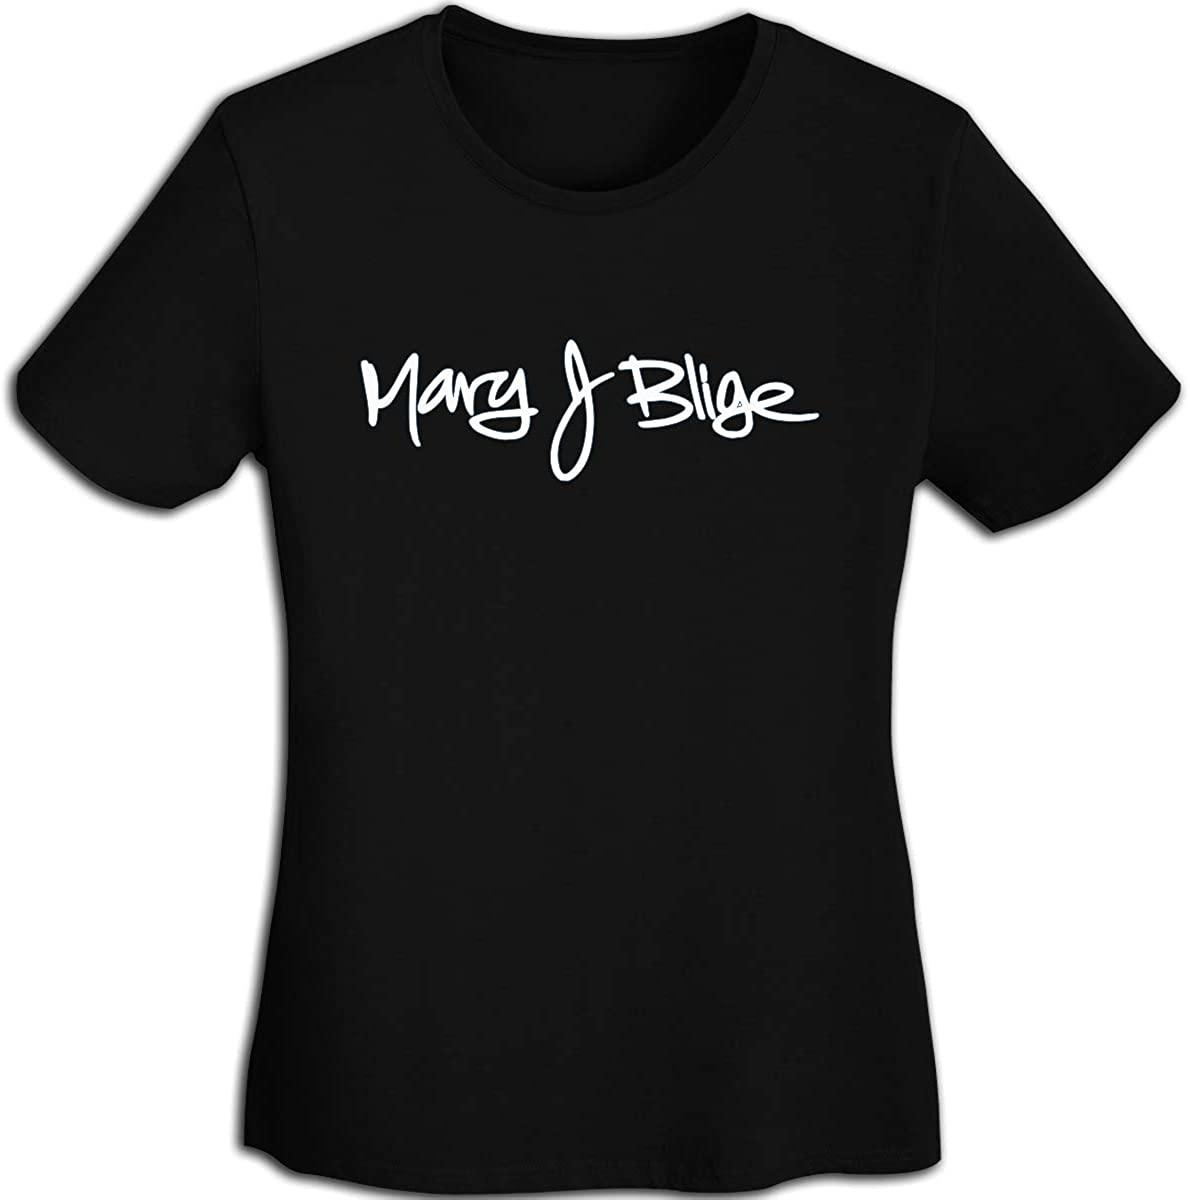 FankTasf Mary J Blige Women's Fashion T-Shirt Teen Girl Printed Short-Sleeved T-Shirt